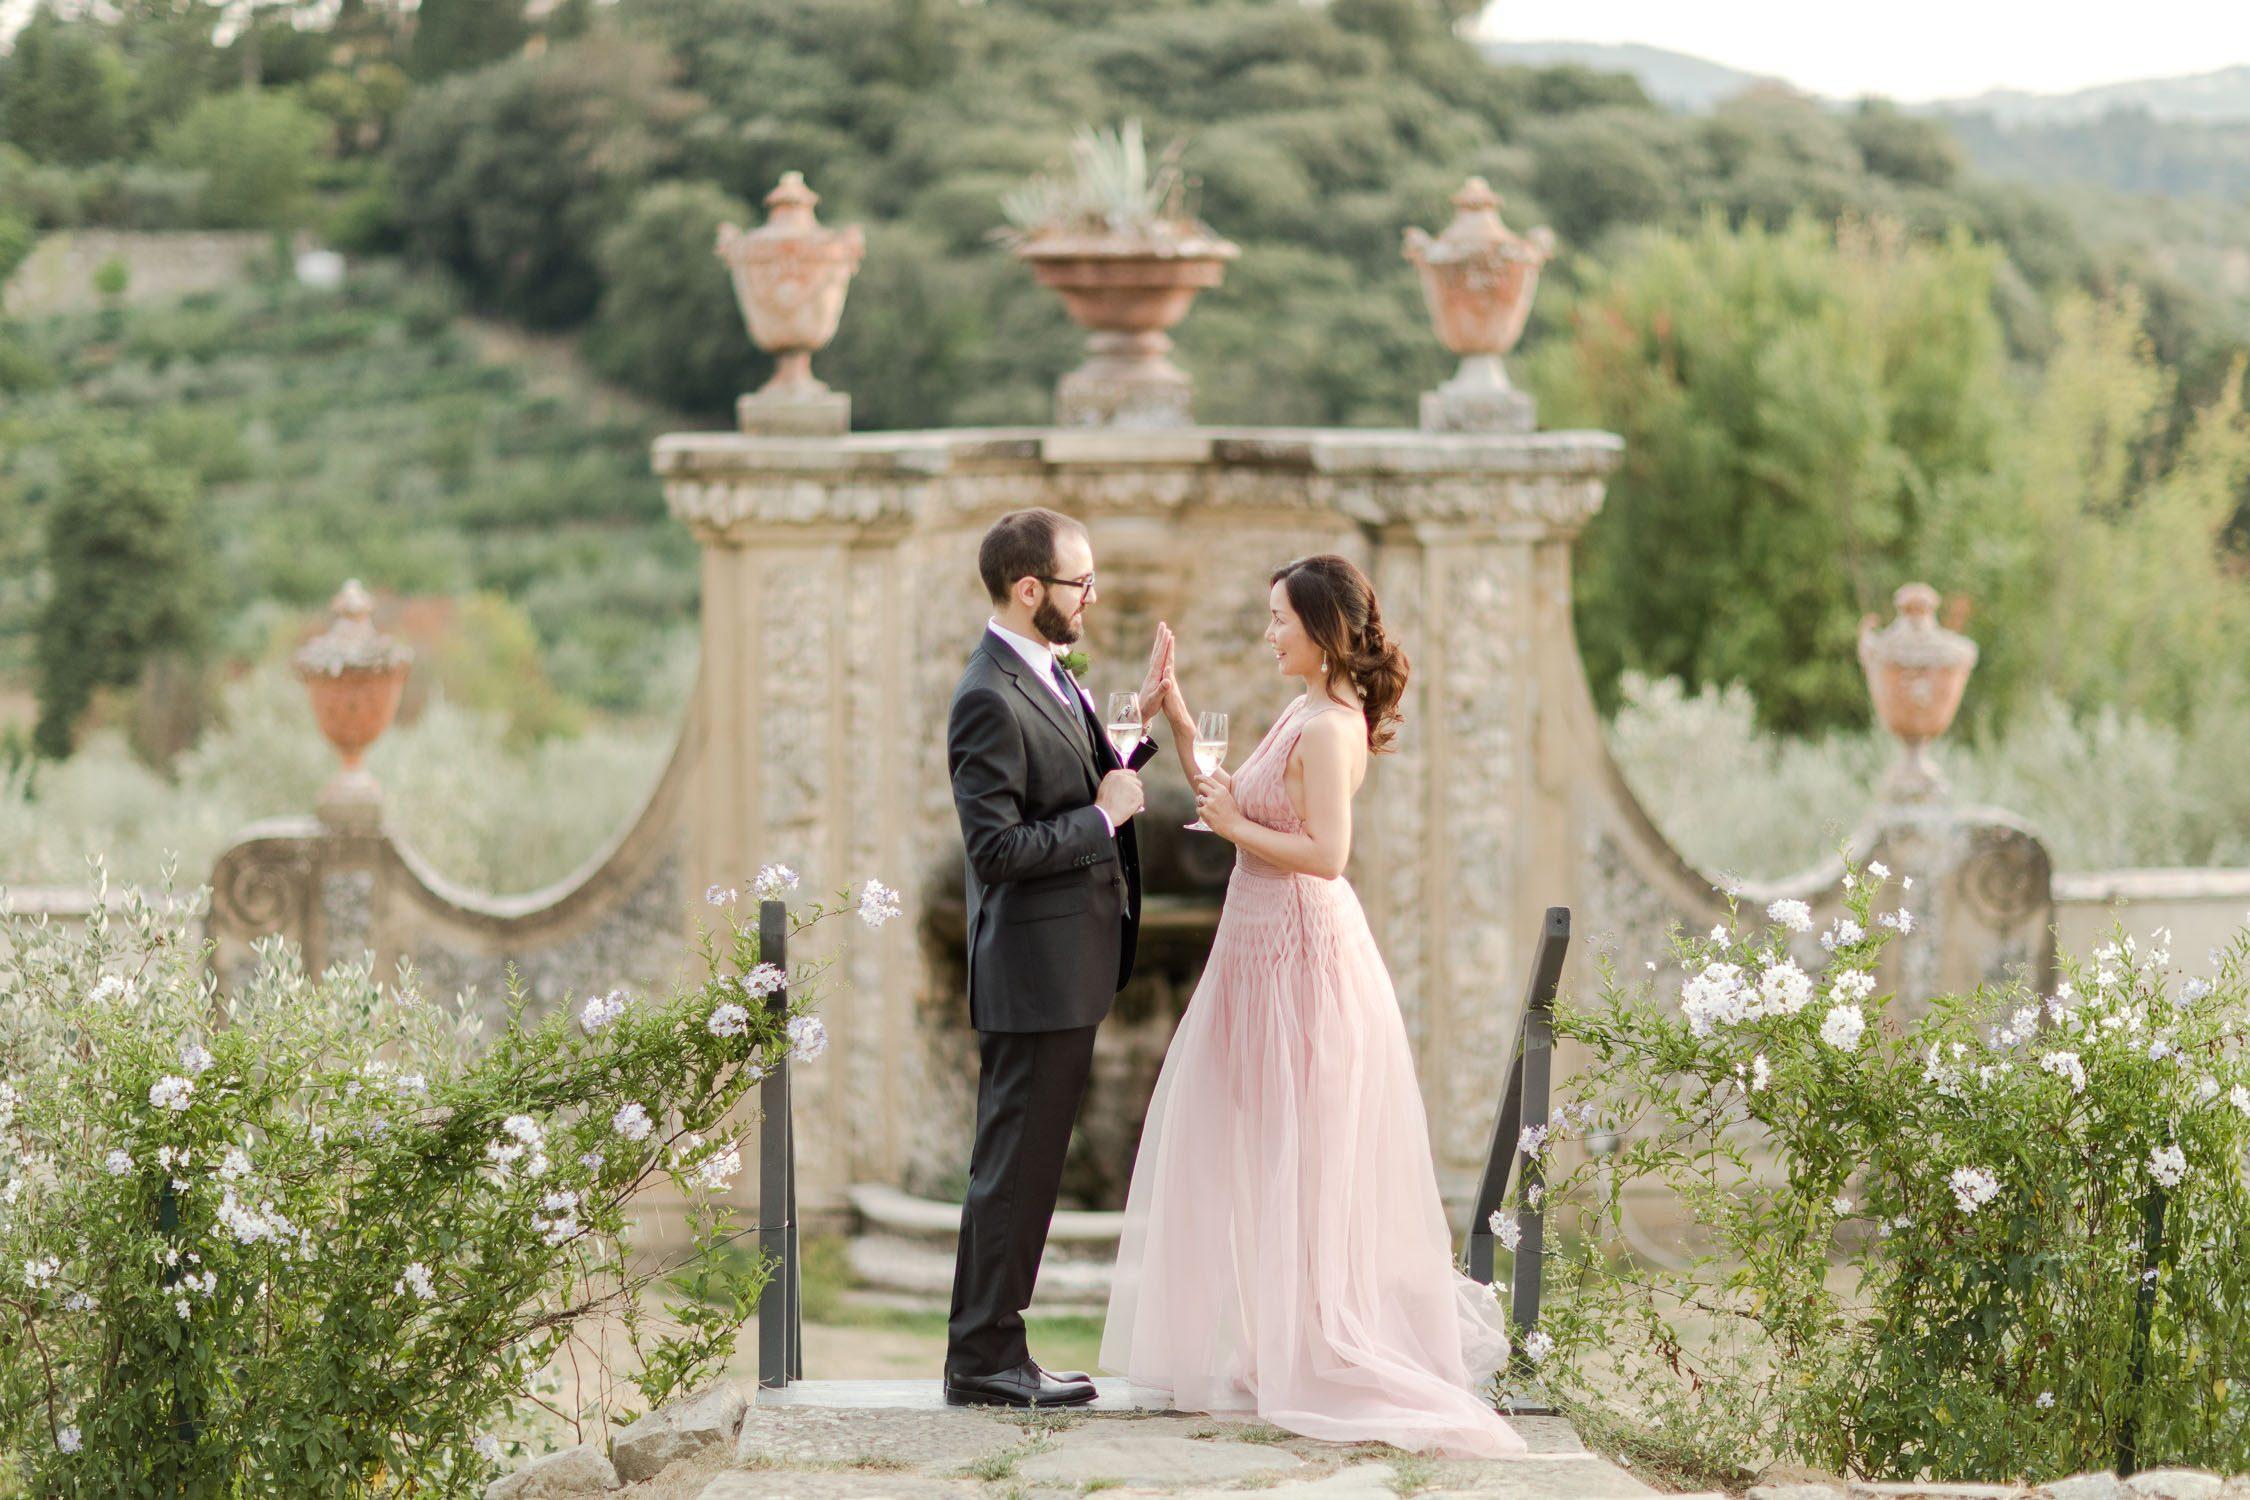 Wedding picture in Florence at Villa Medicea di Liliano